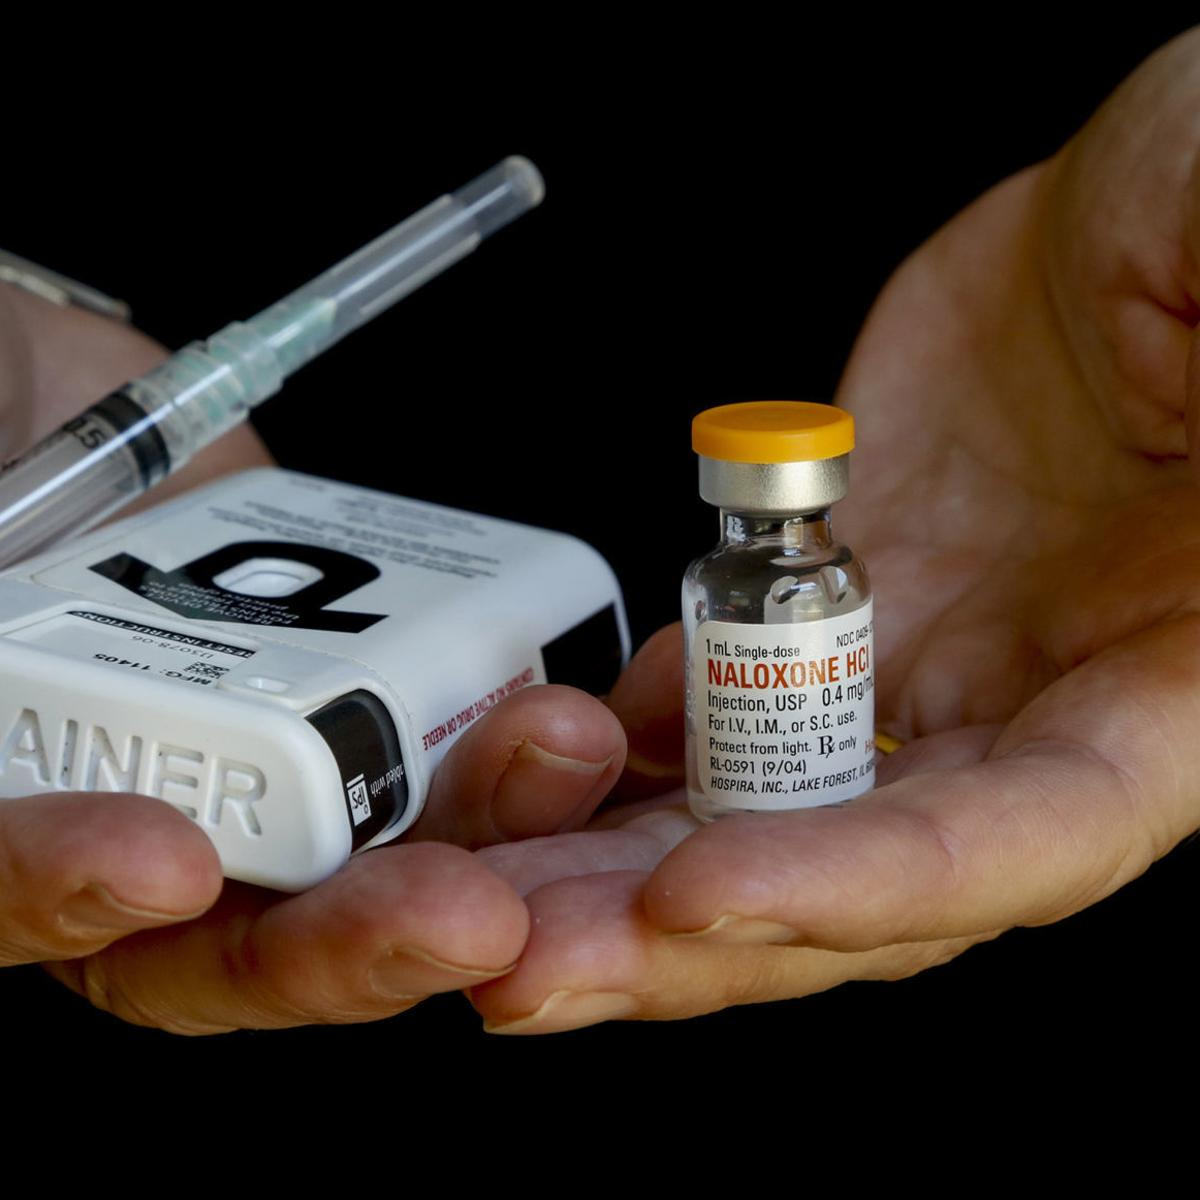 New naloxone laws seek to prevent opioid overdoses | Health